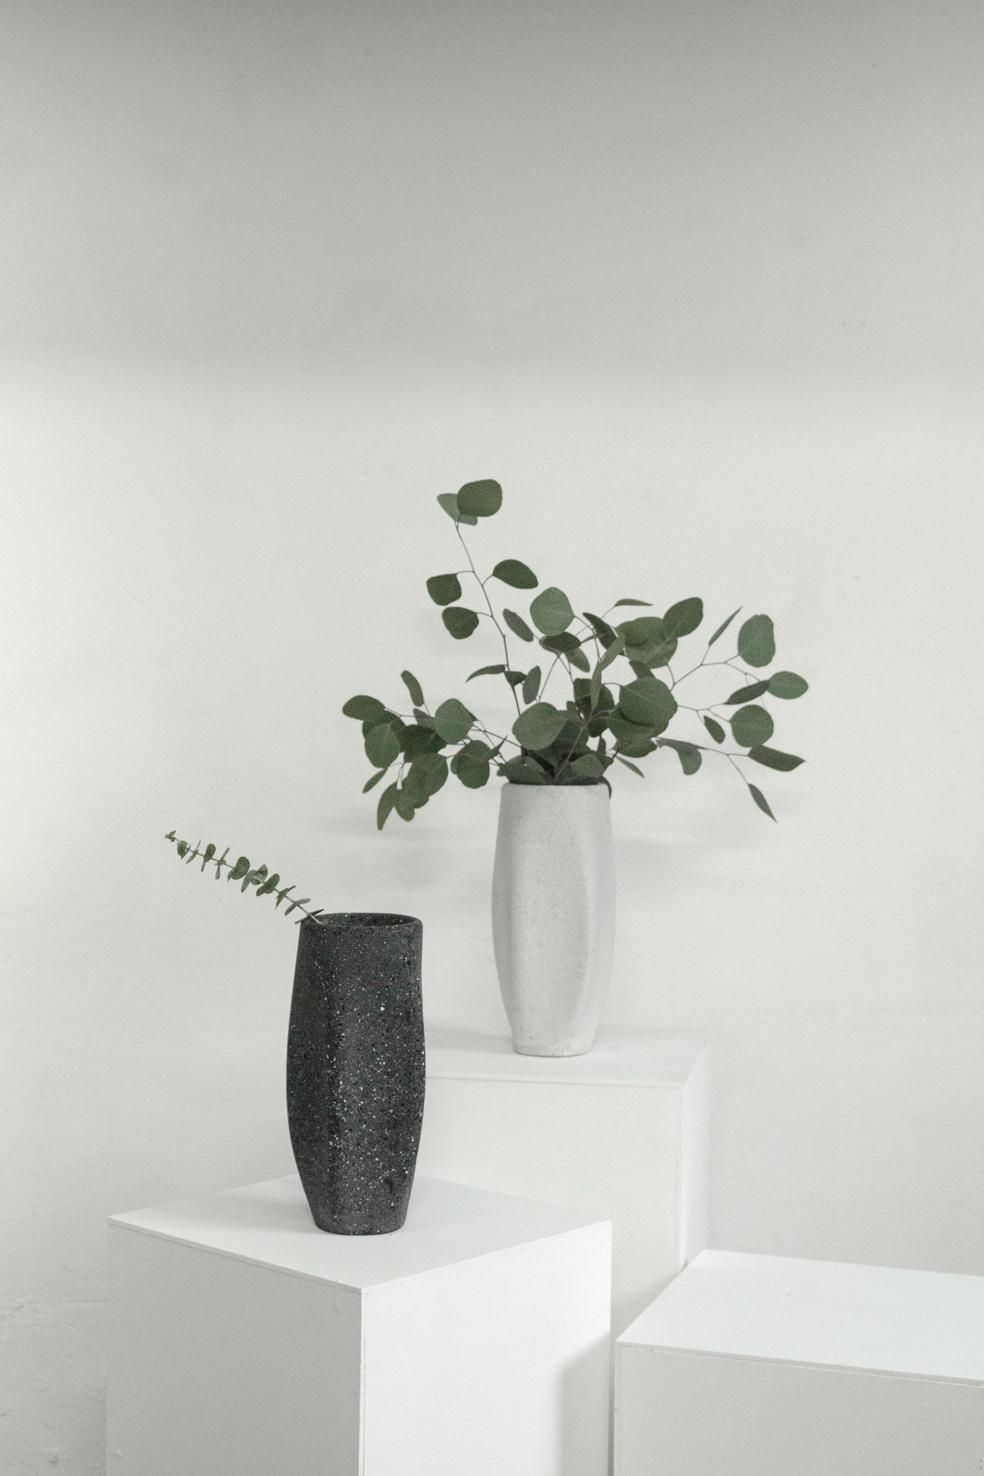 Tecnolitico-black-white-lr.jpg